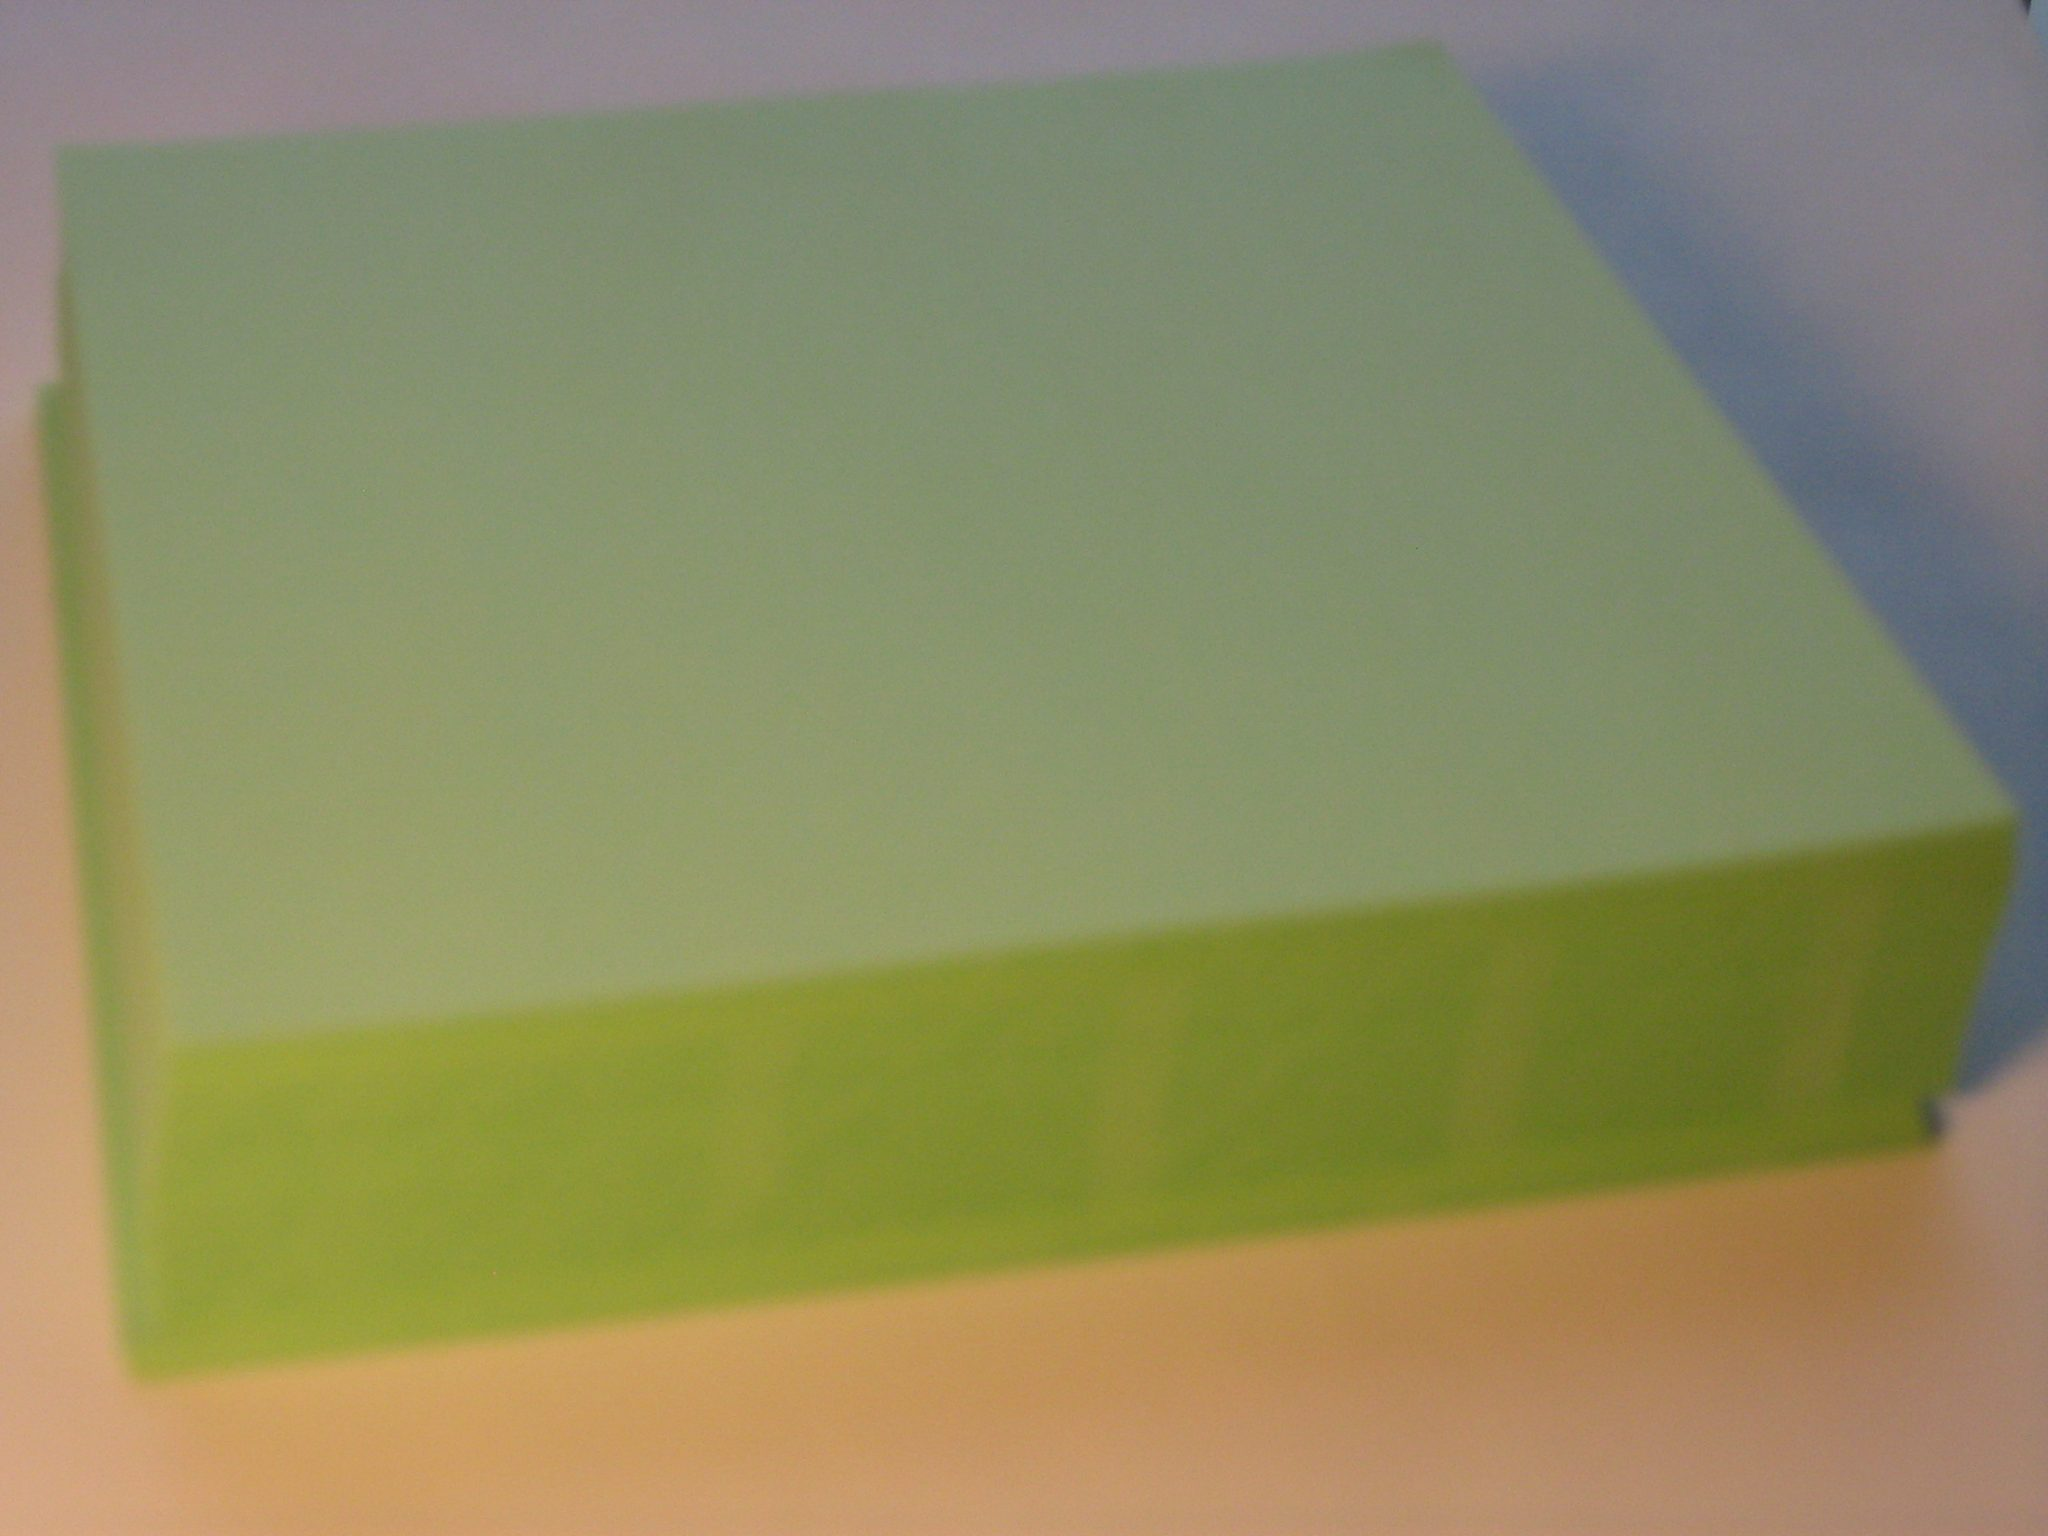 49g Green Metal Inset Paper 55 X 55 250 Sheets Pkg